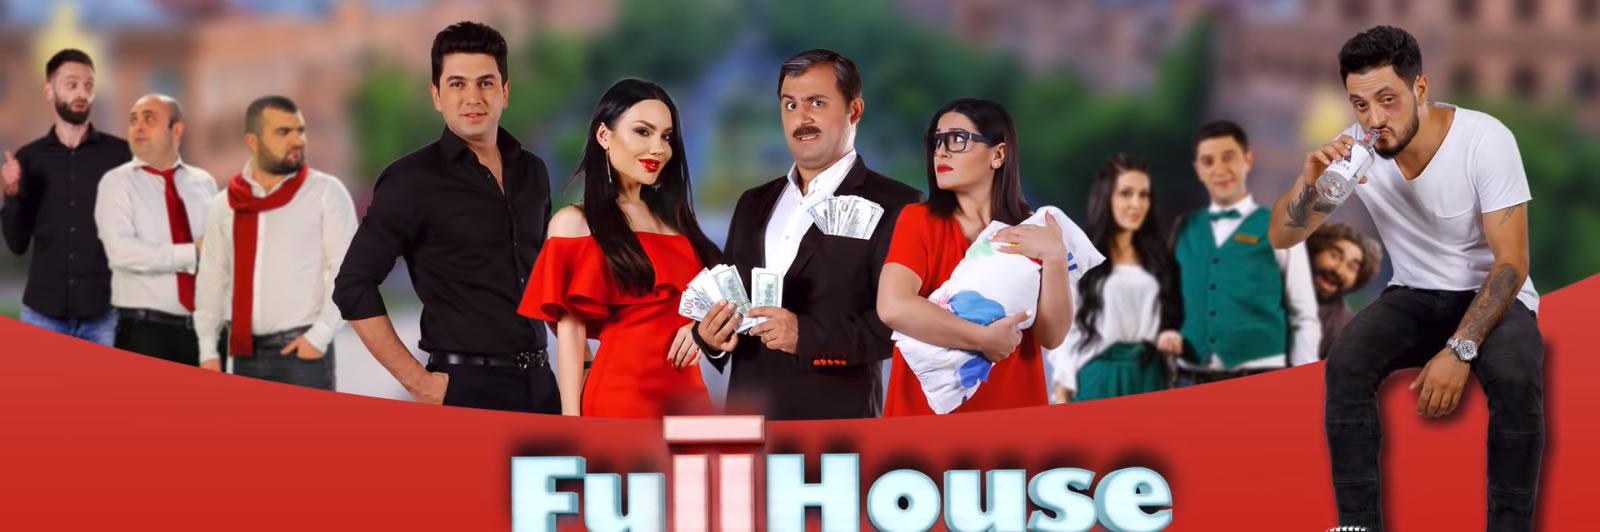 Full House Armenian TV Series - HamovHotov